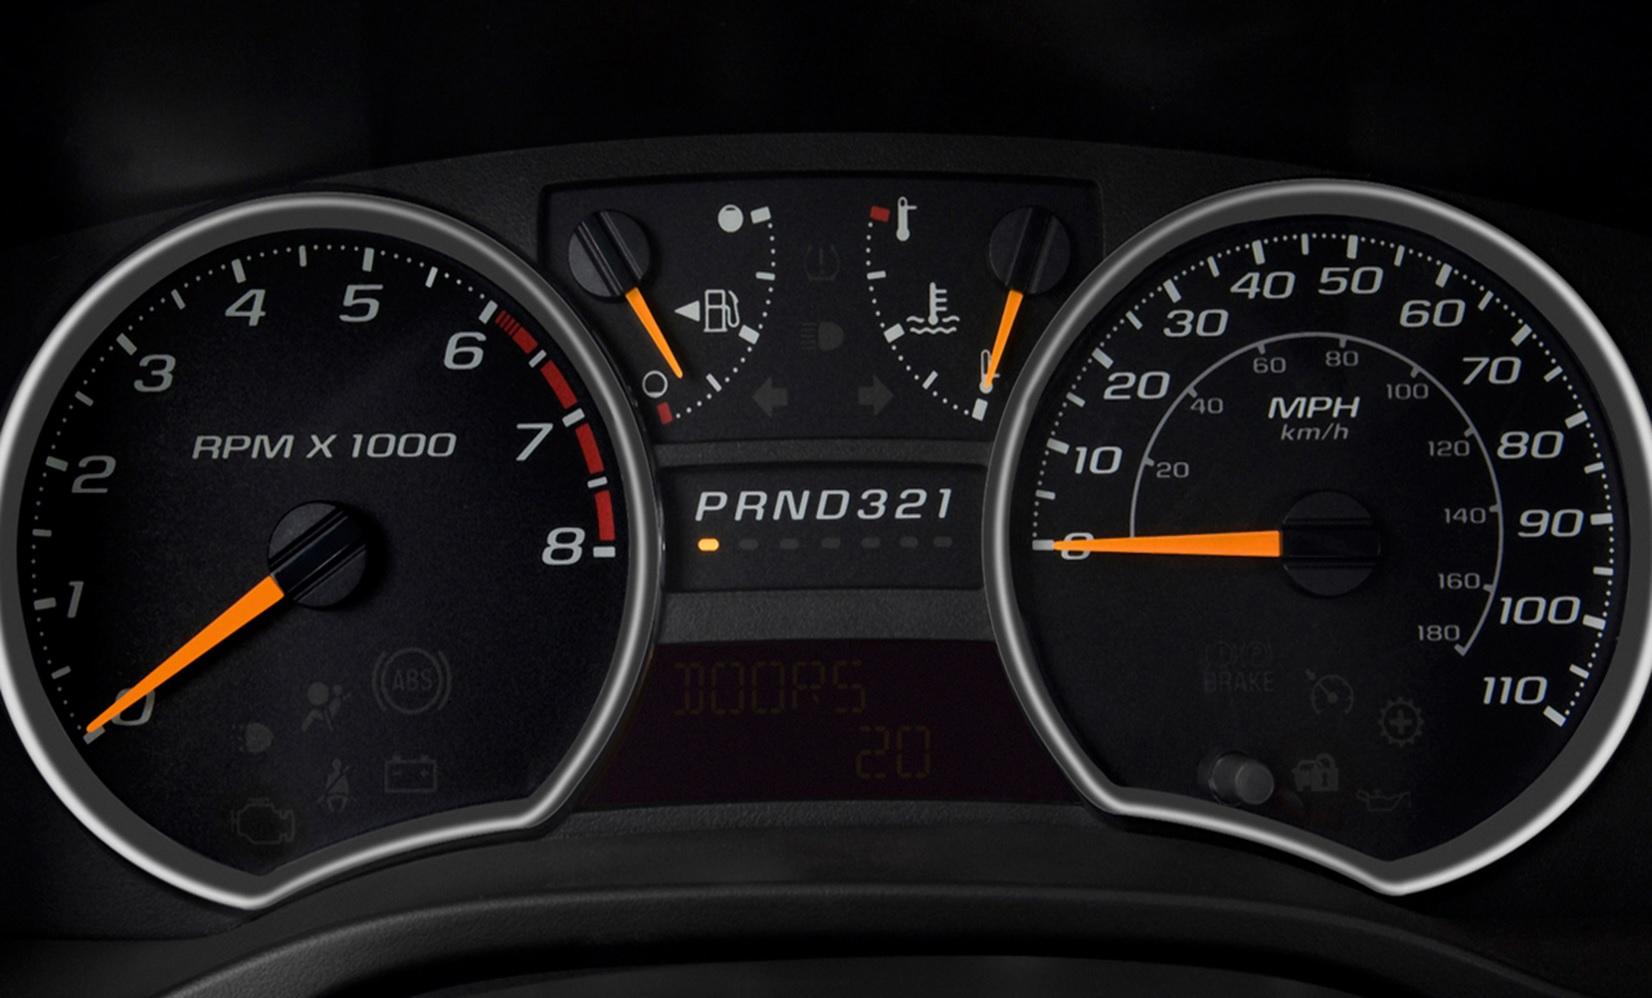 Chevy Colorado Speedometer Instrument Cluster Not Working Gas Fuel Speed Temp Gauges Do Not Work Sku